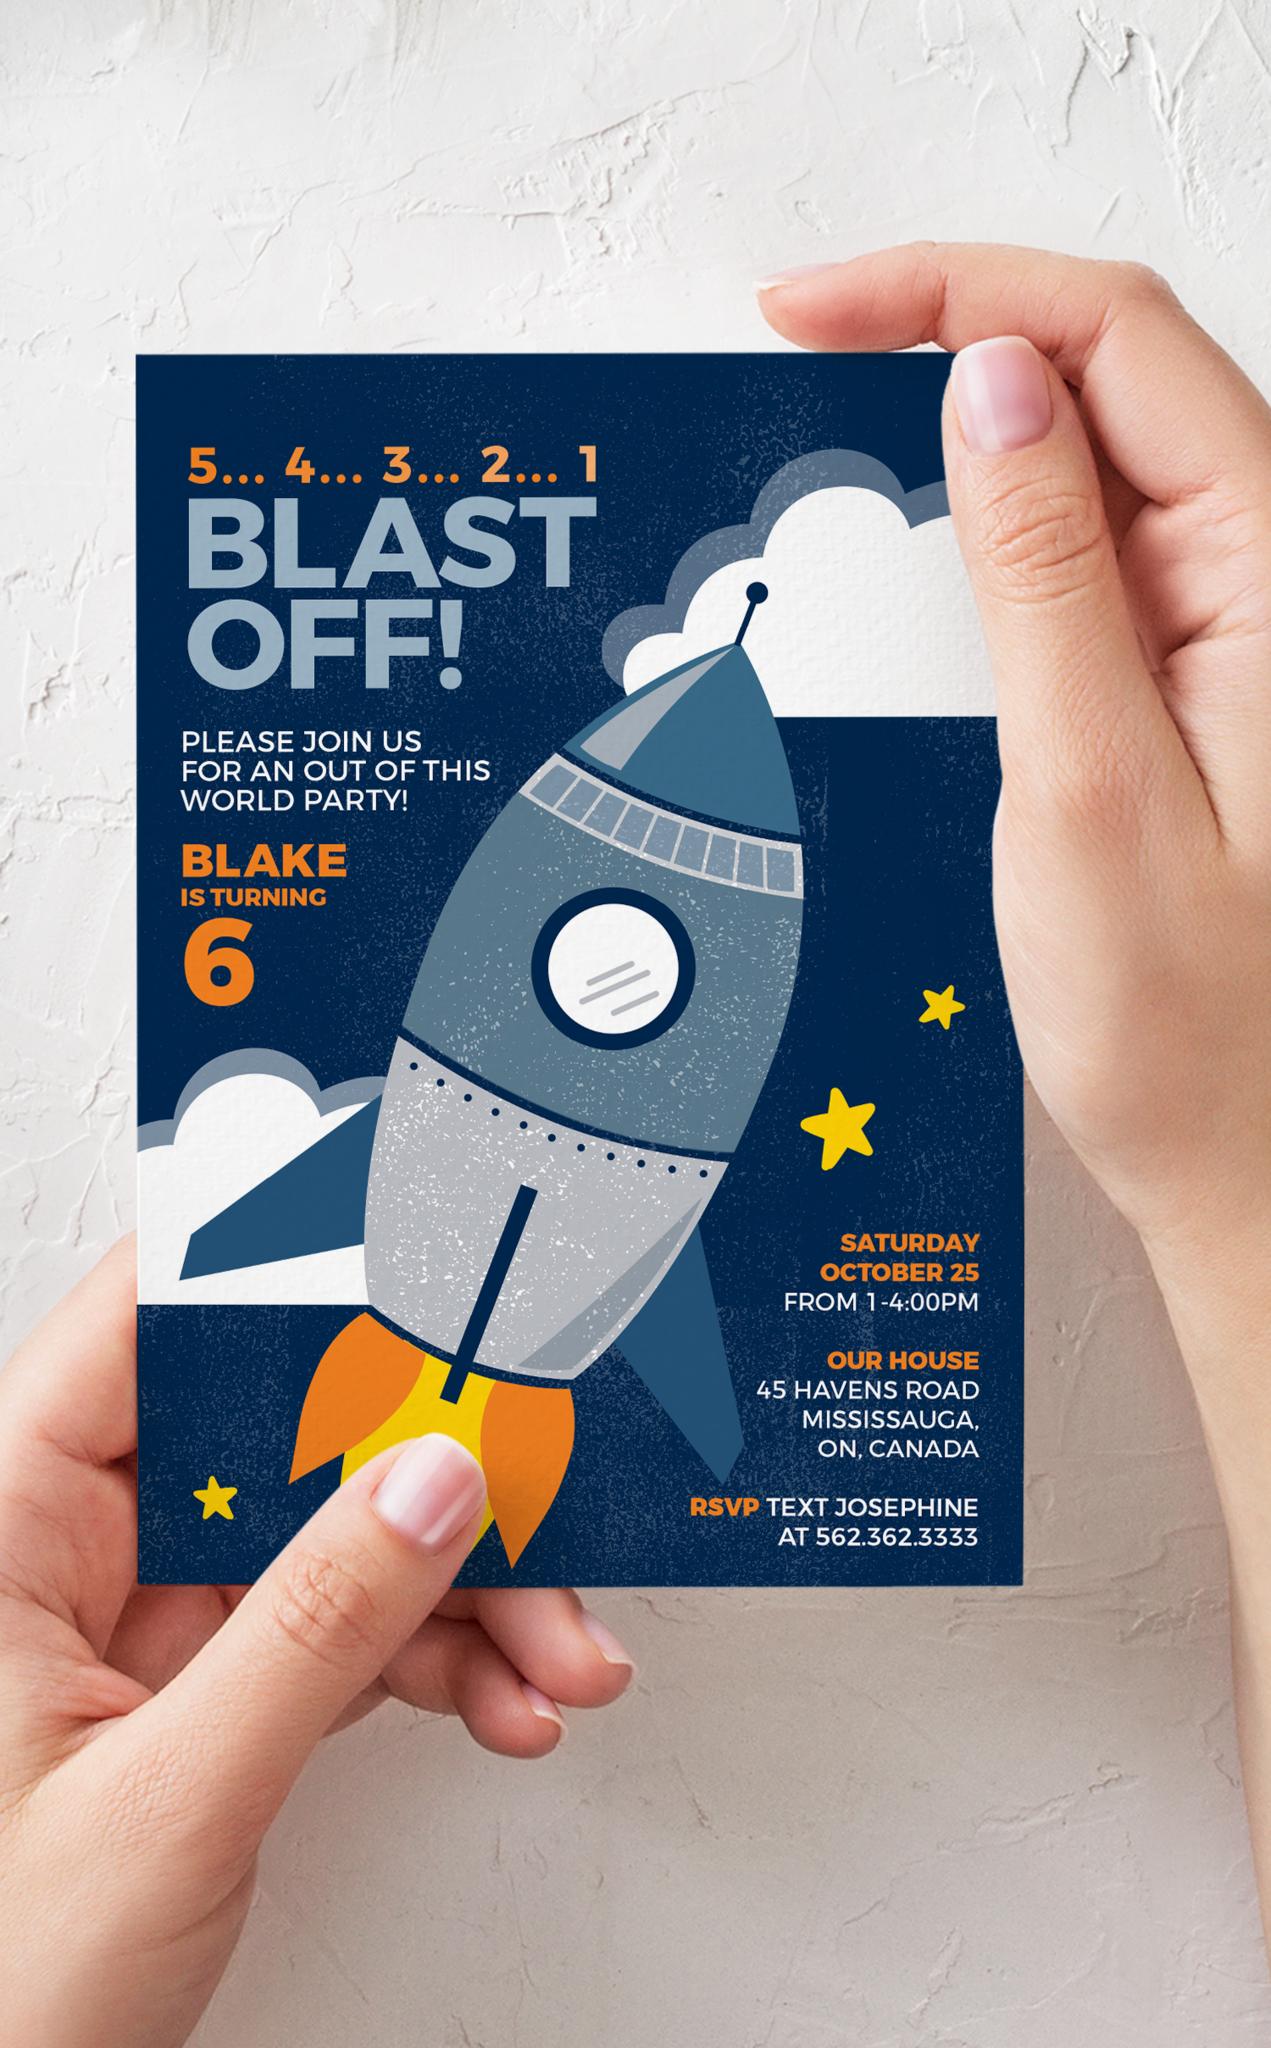 Blast Off! Rocket Birthday Party Invitation ในปี 2020